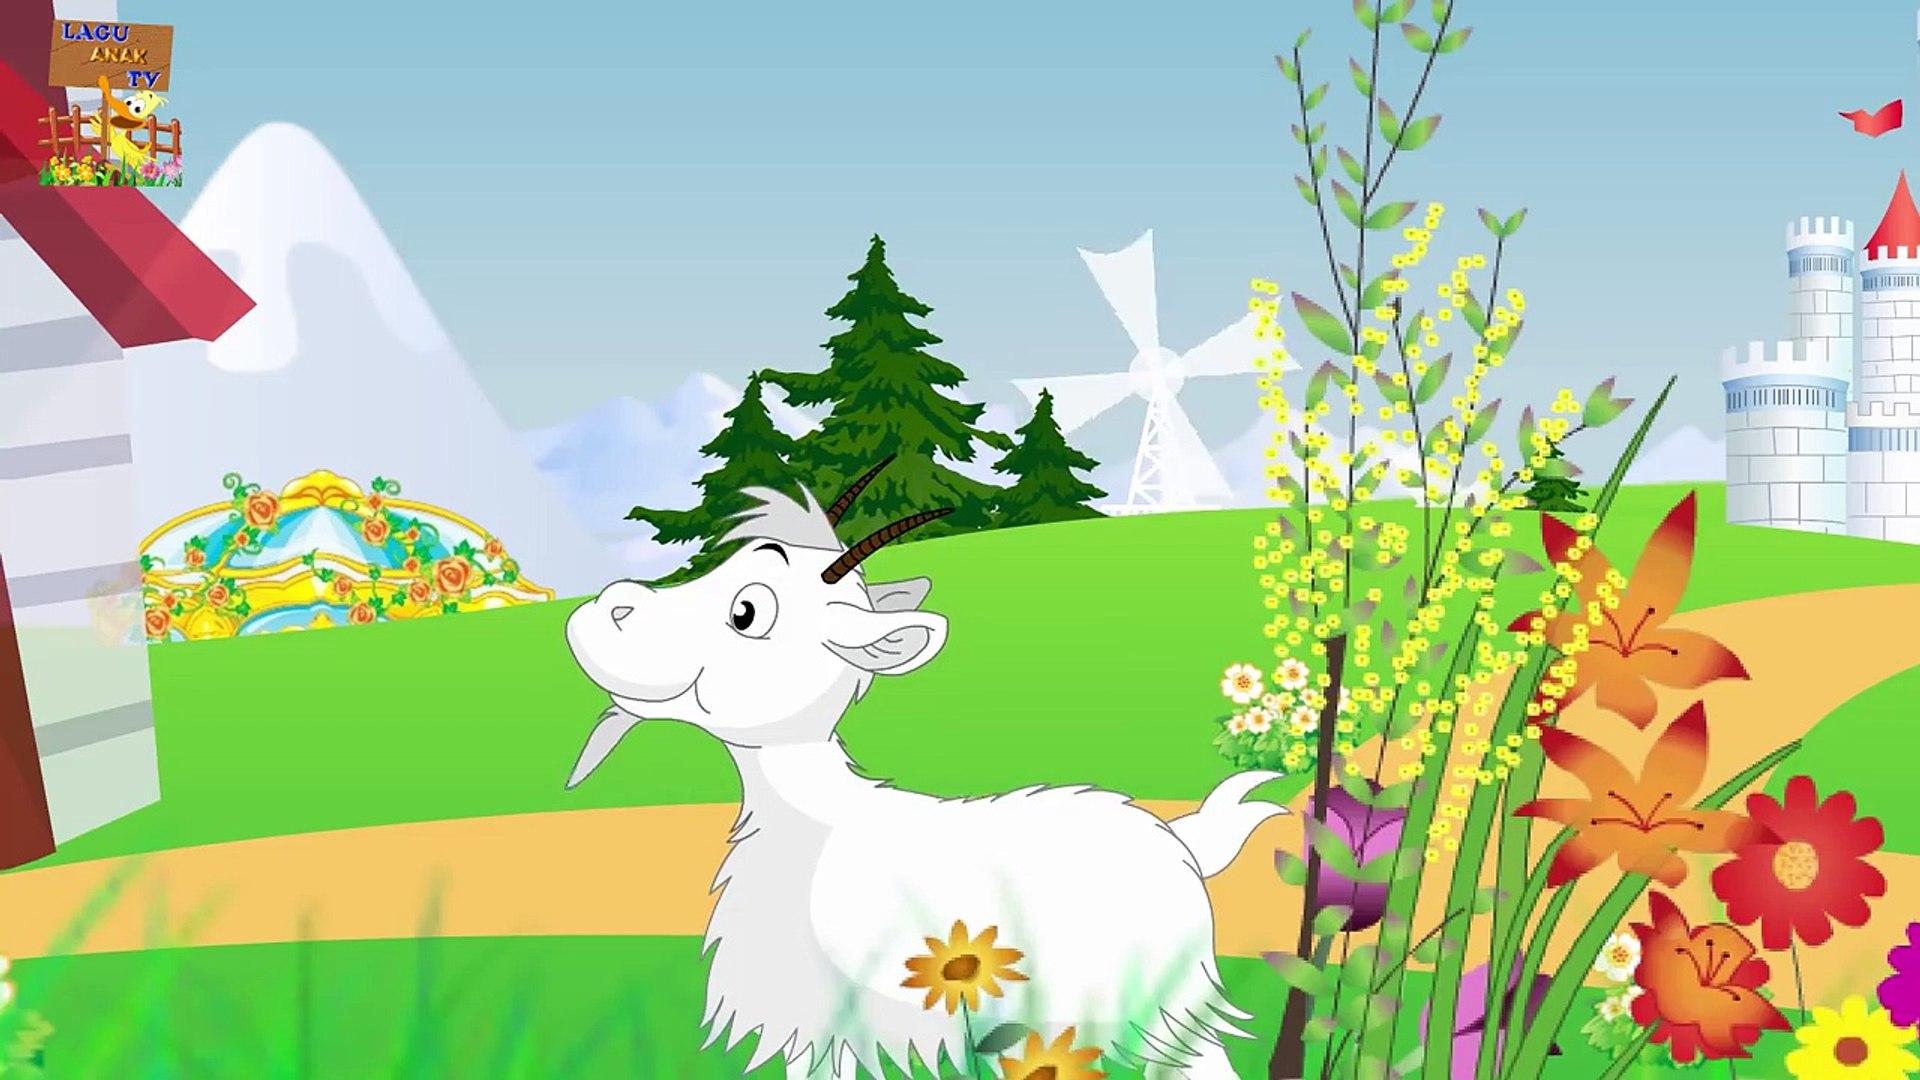 Hewan Ternak Kuda Sapi Kambing Babi Domba